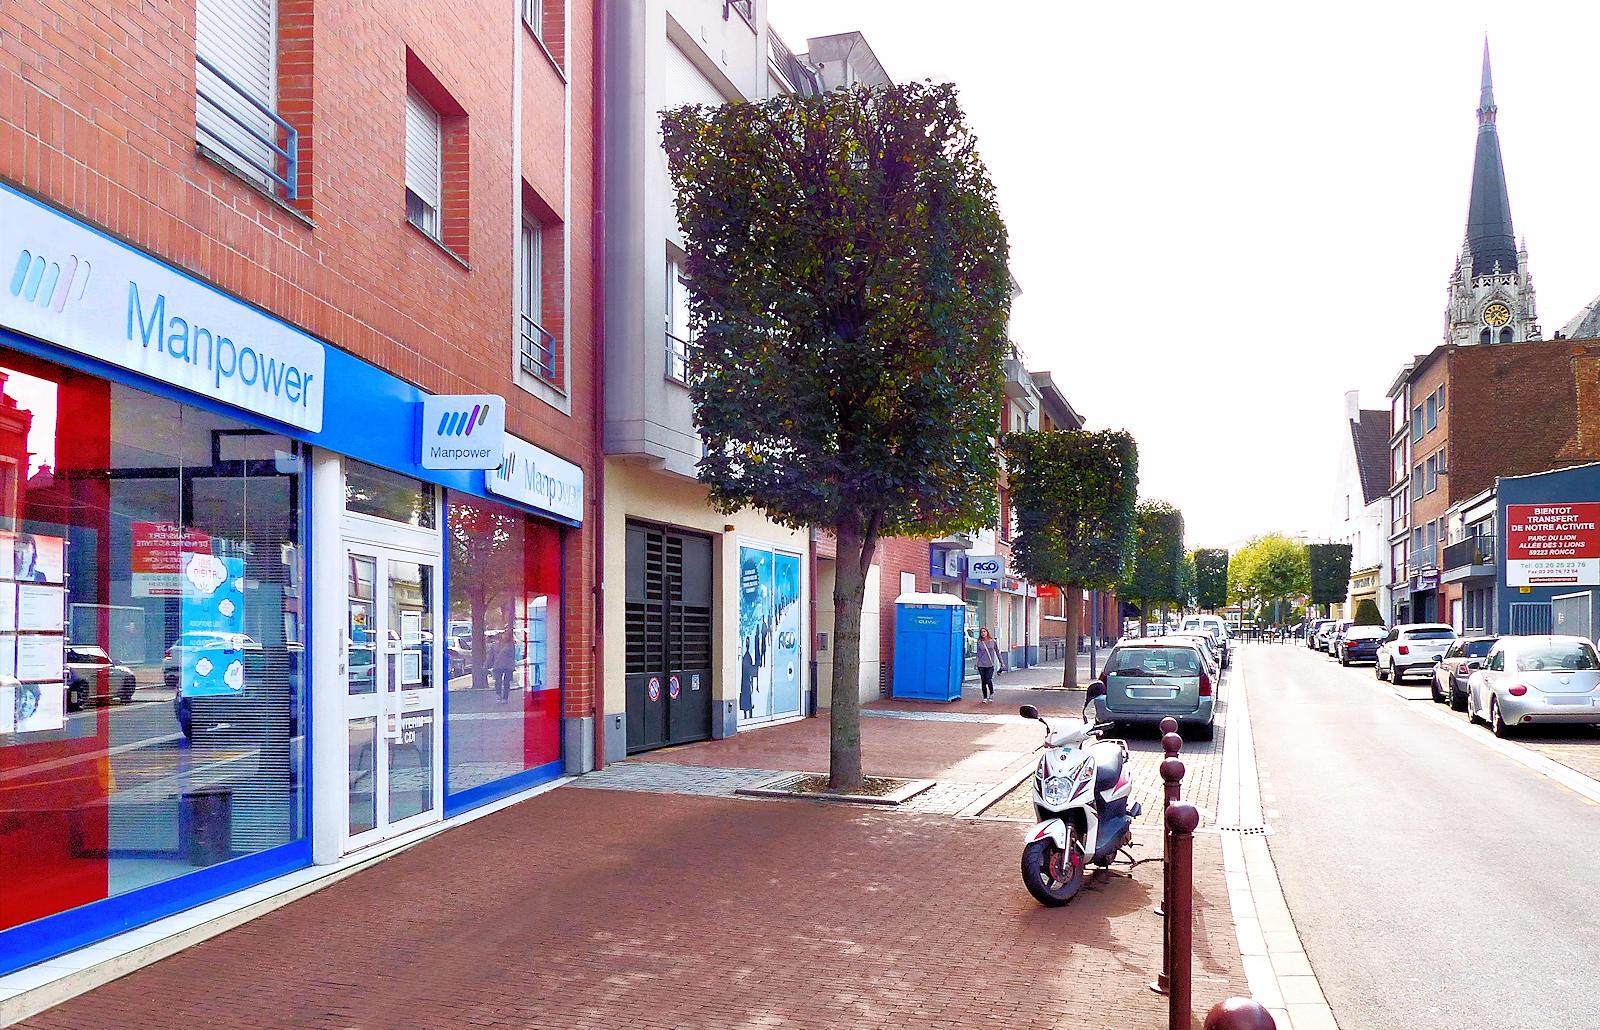 Manpower Interim - Rue de la Cloche, Tourcoing